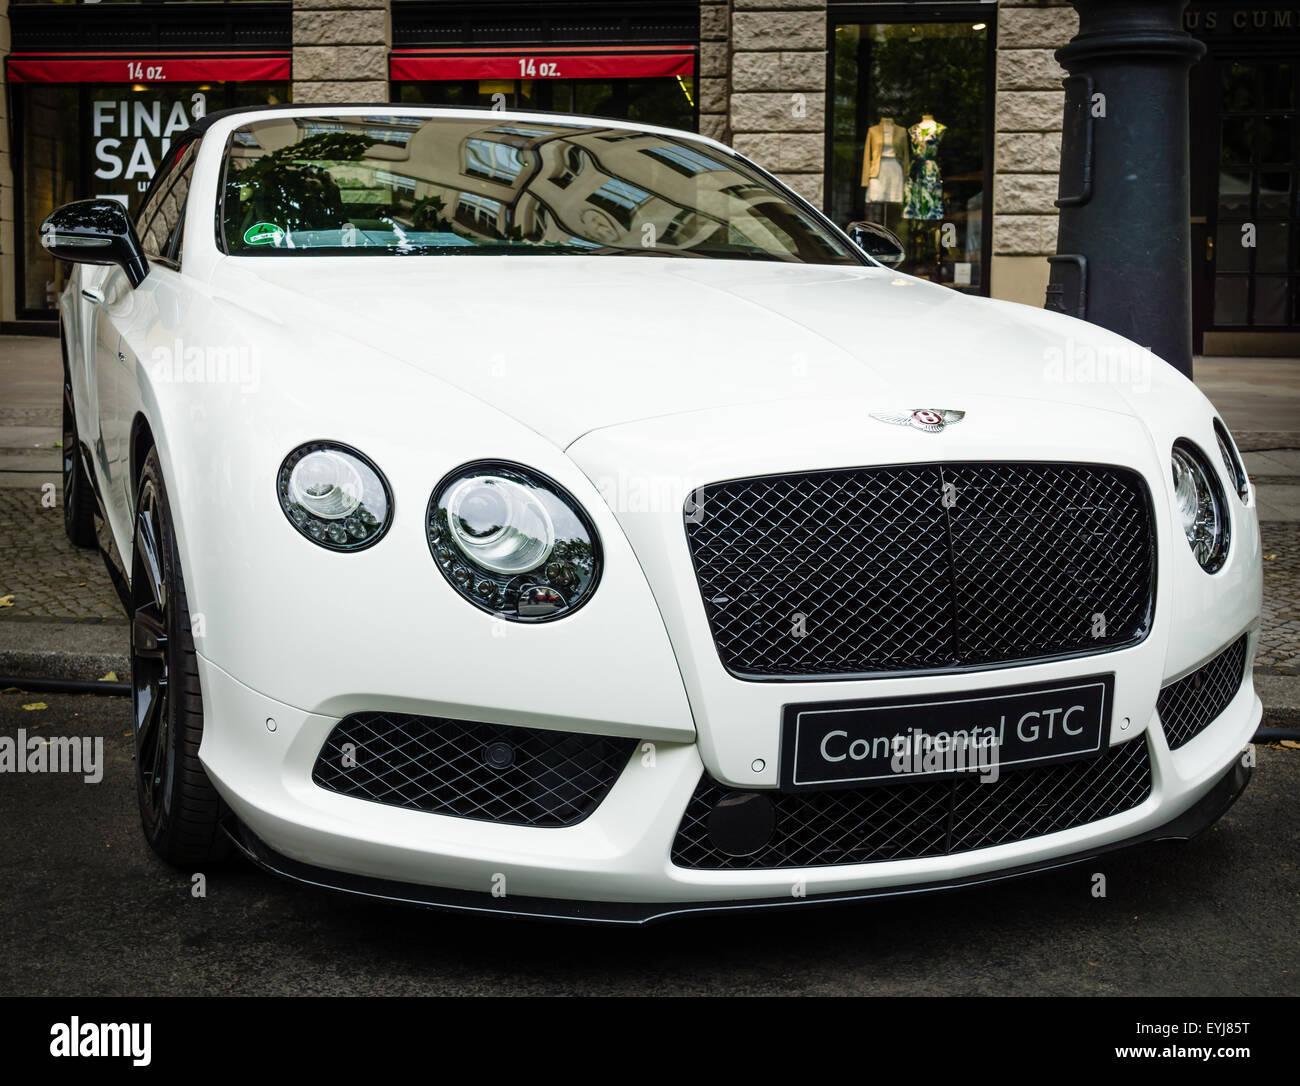 Bentley Continental Gtc Stock Photos Bentley Continental